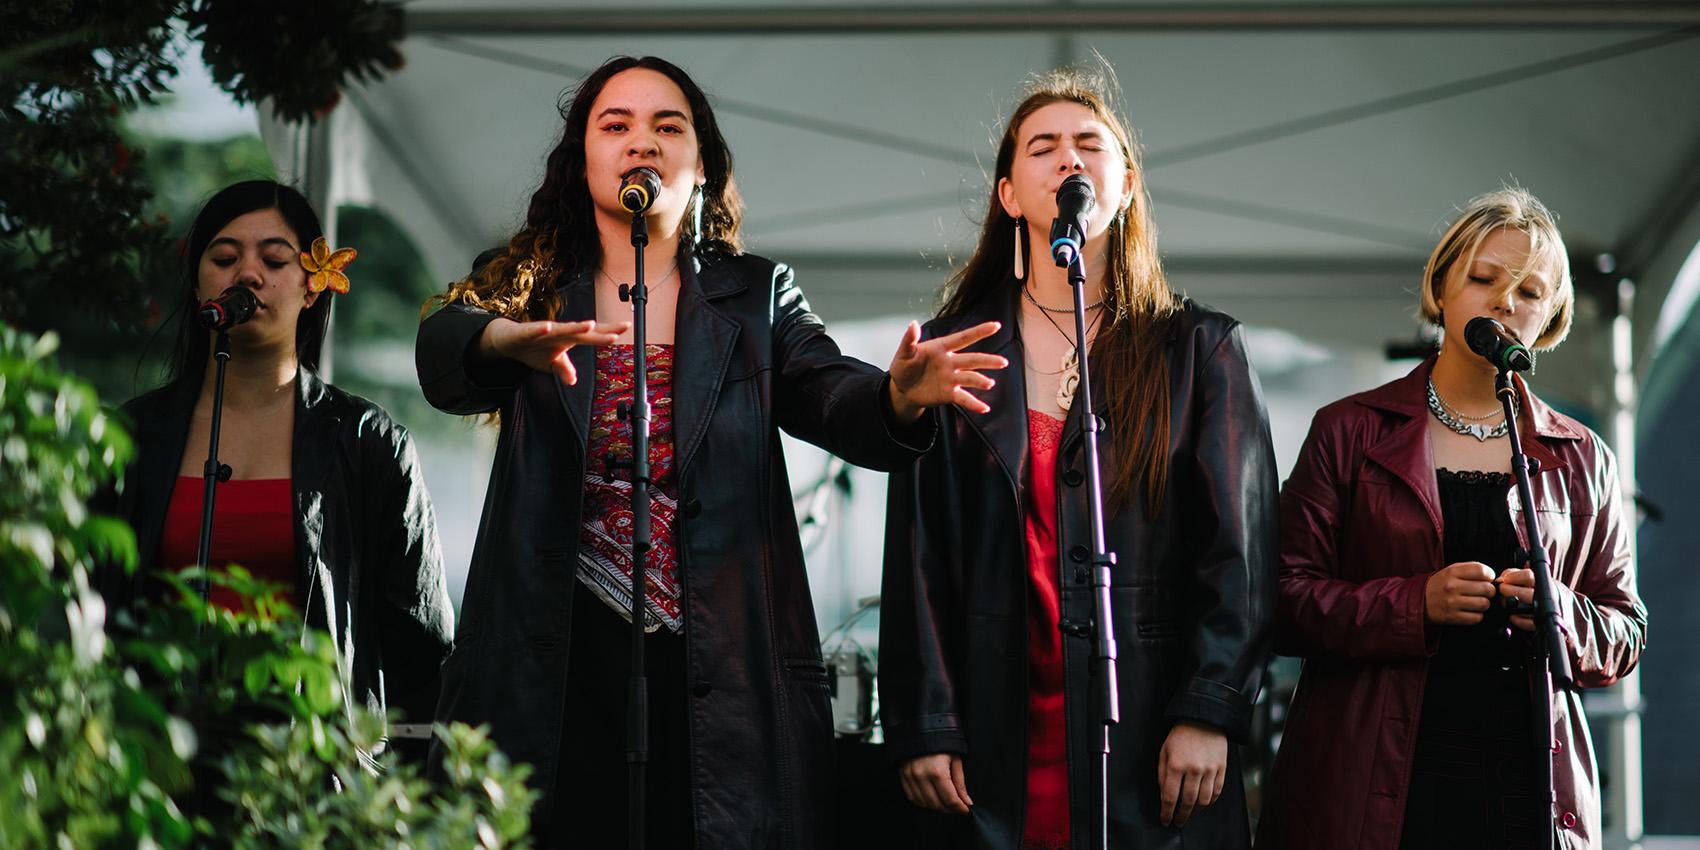 Ngā Hinepūkōrero – Spoken Word Poets